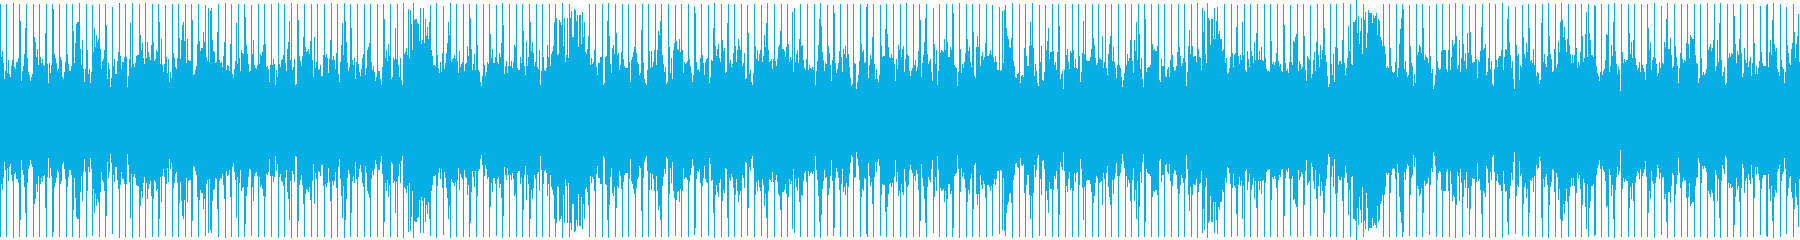 [Playback] old Funk loop's reproduced waveform